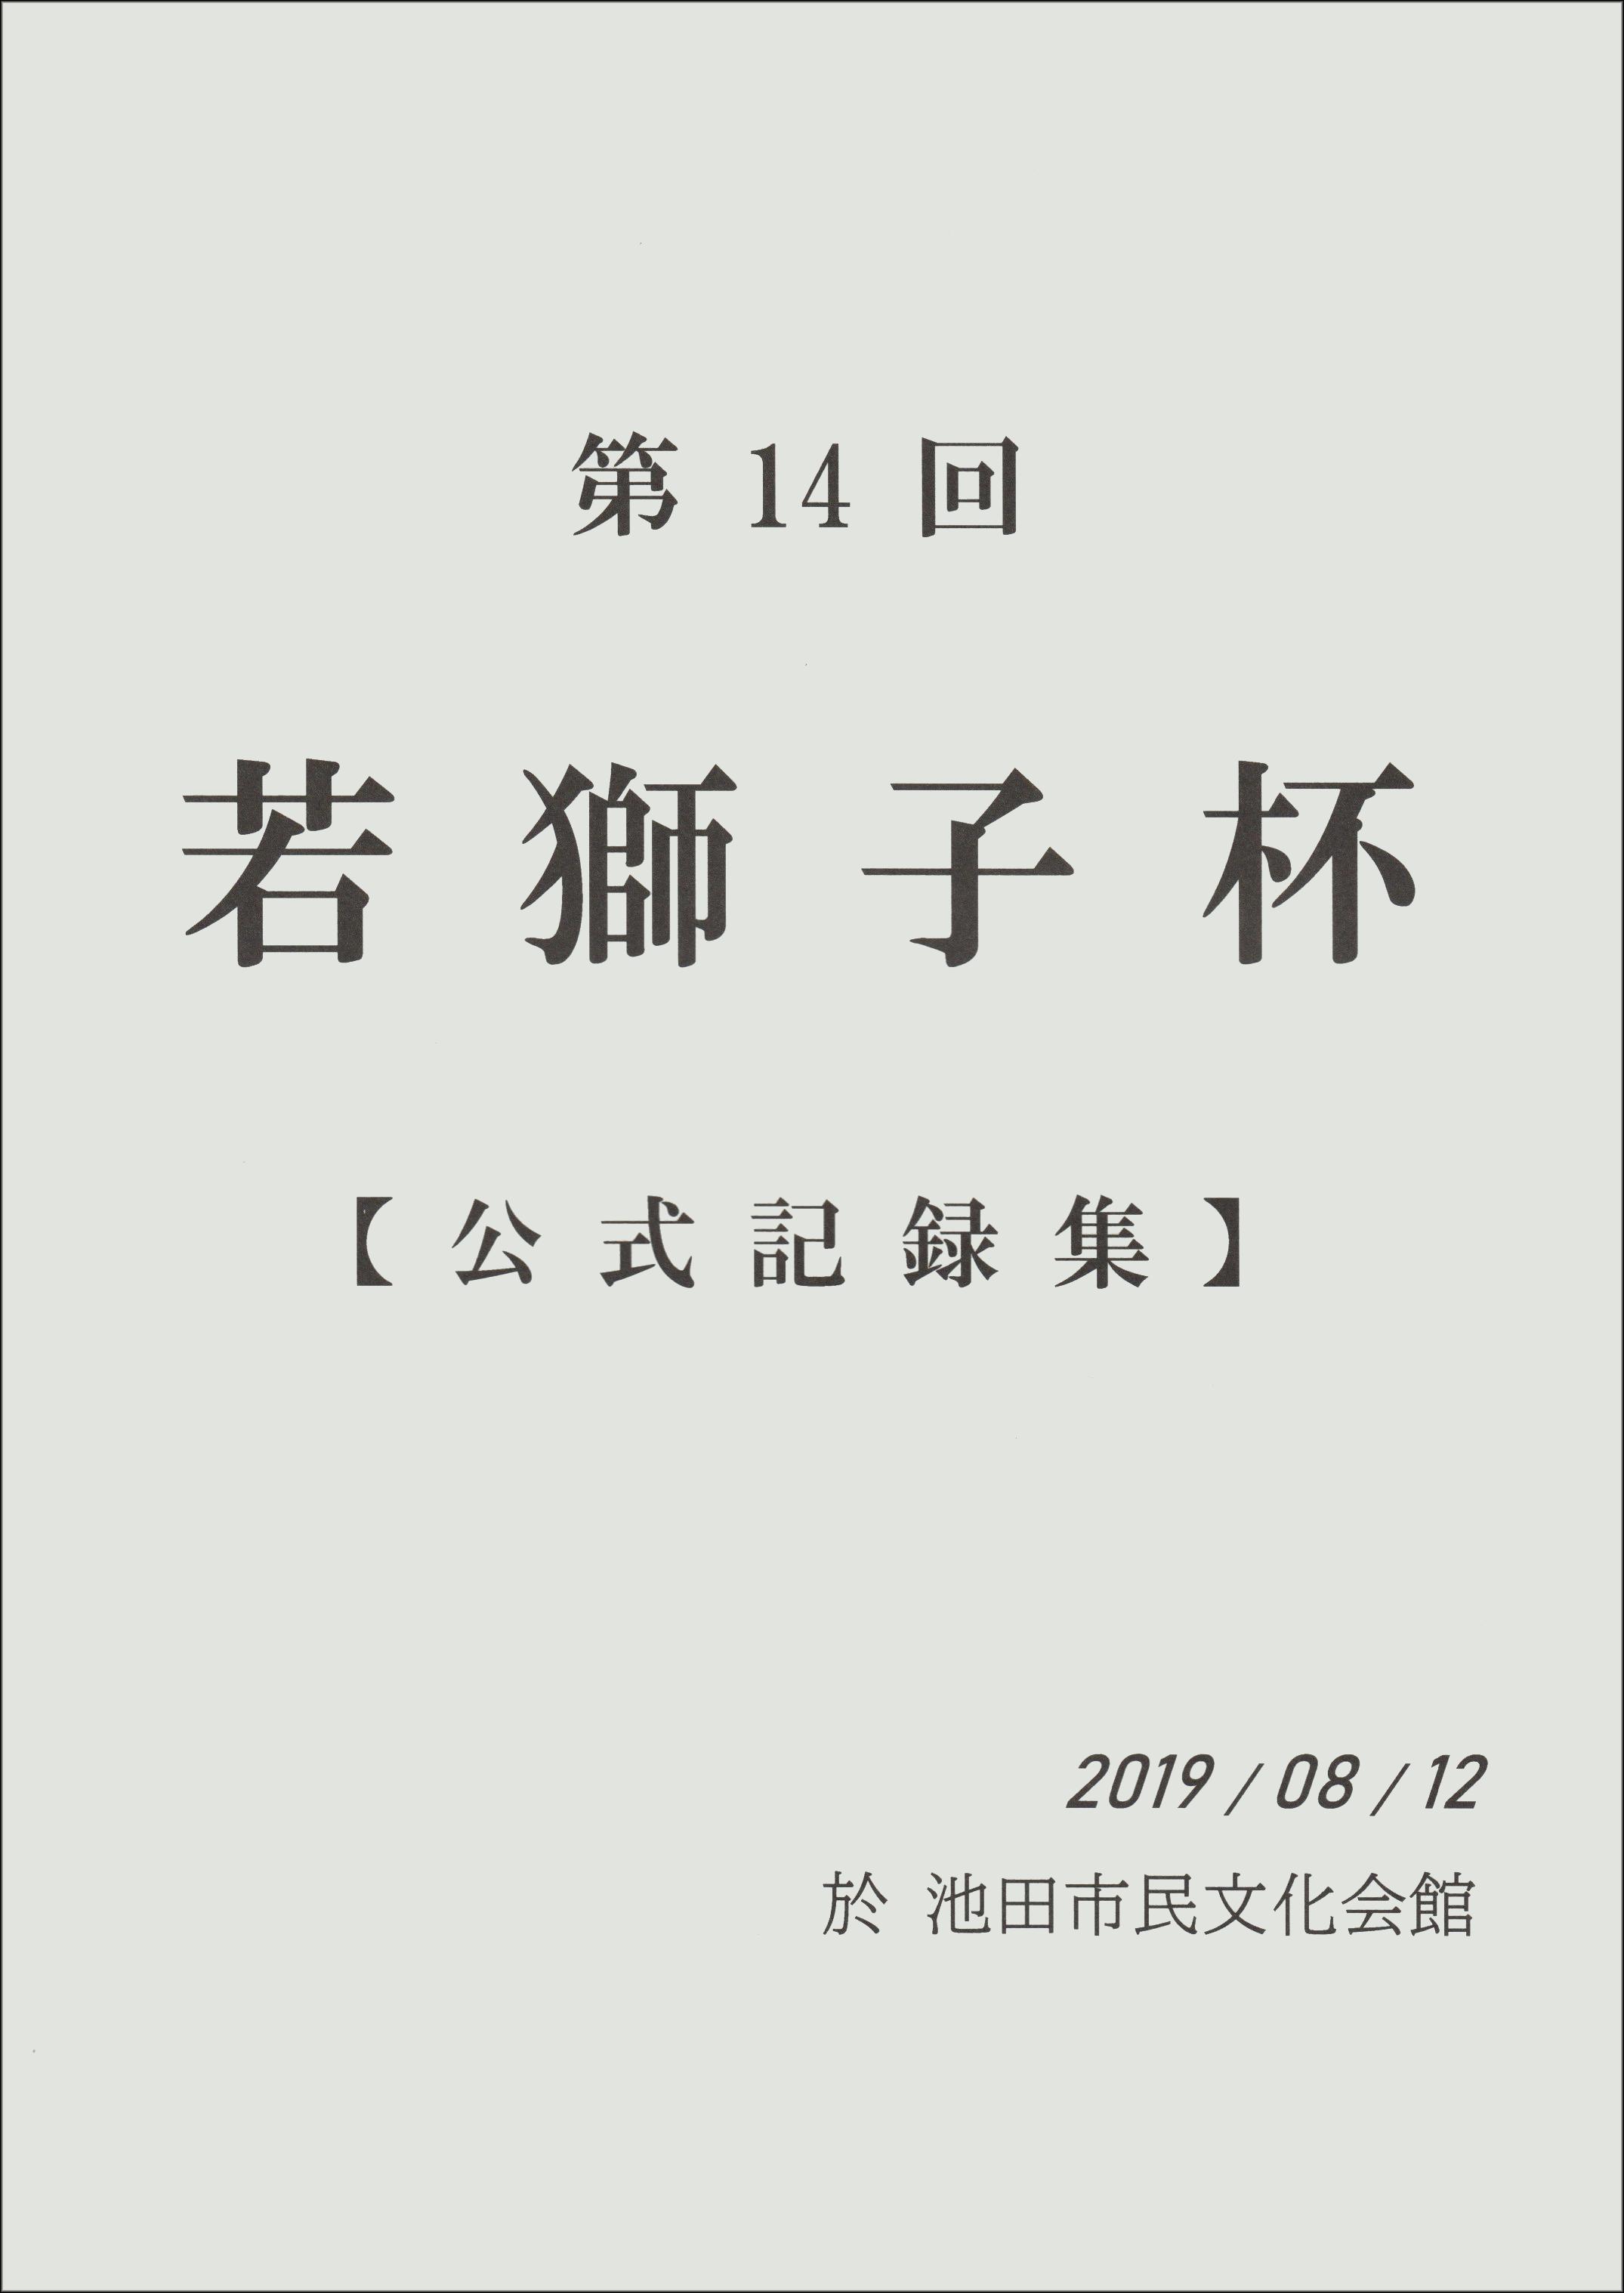 C13301999